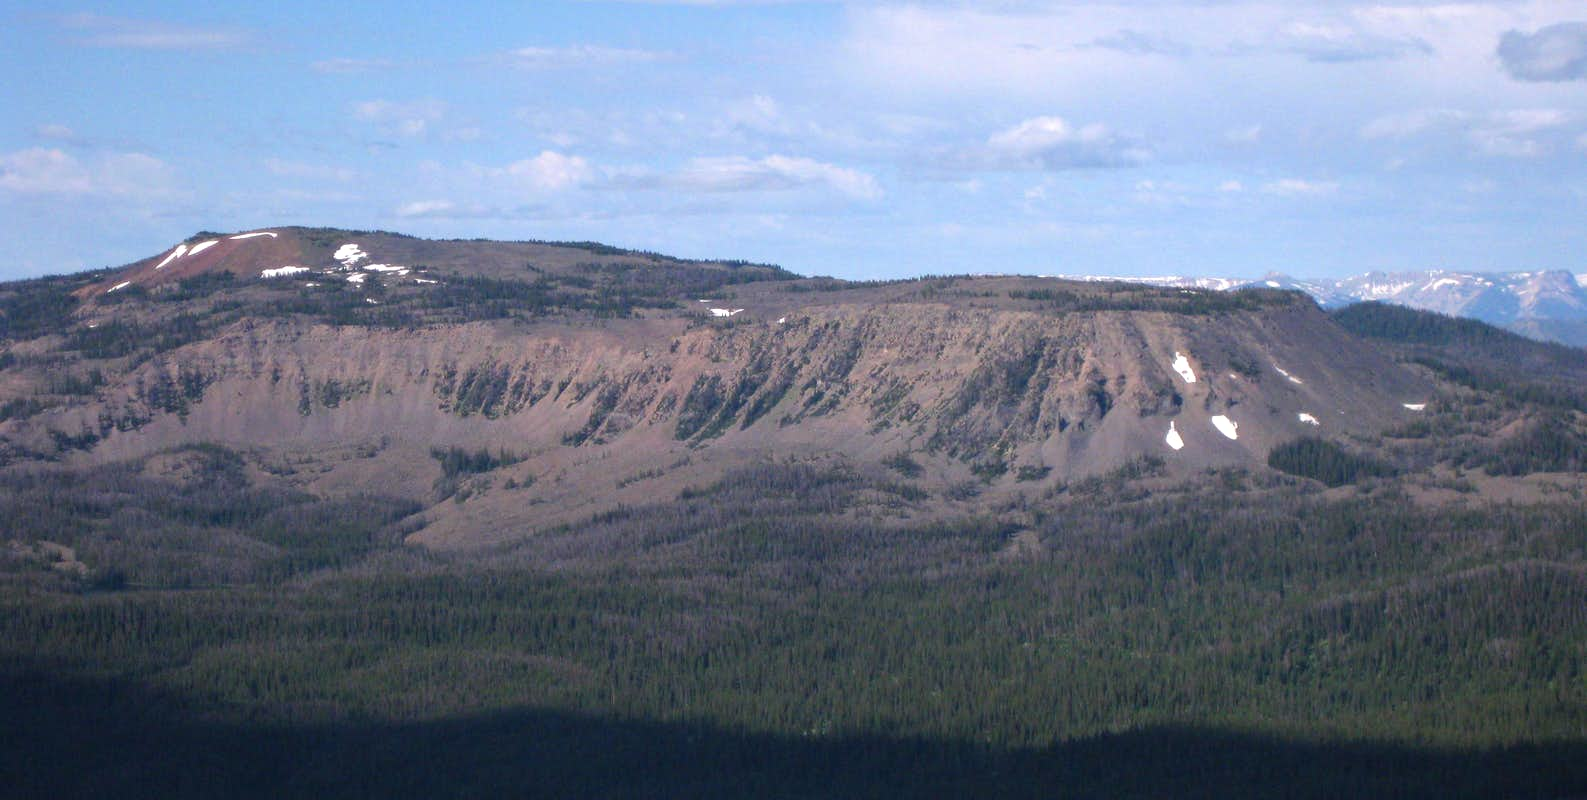 lava mountain volcano - photo #29